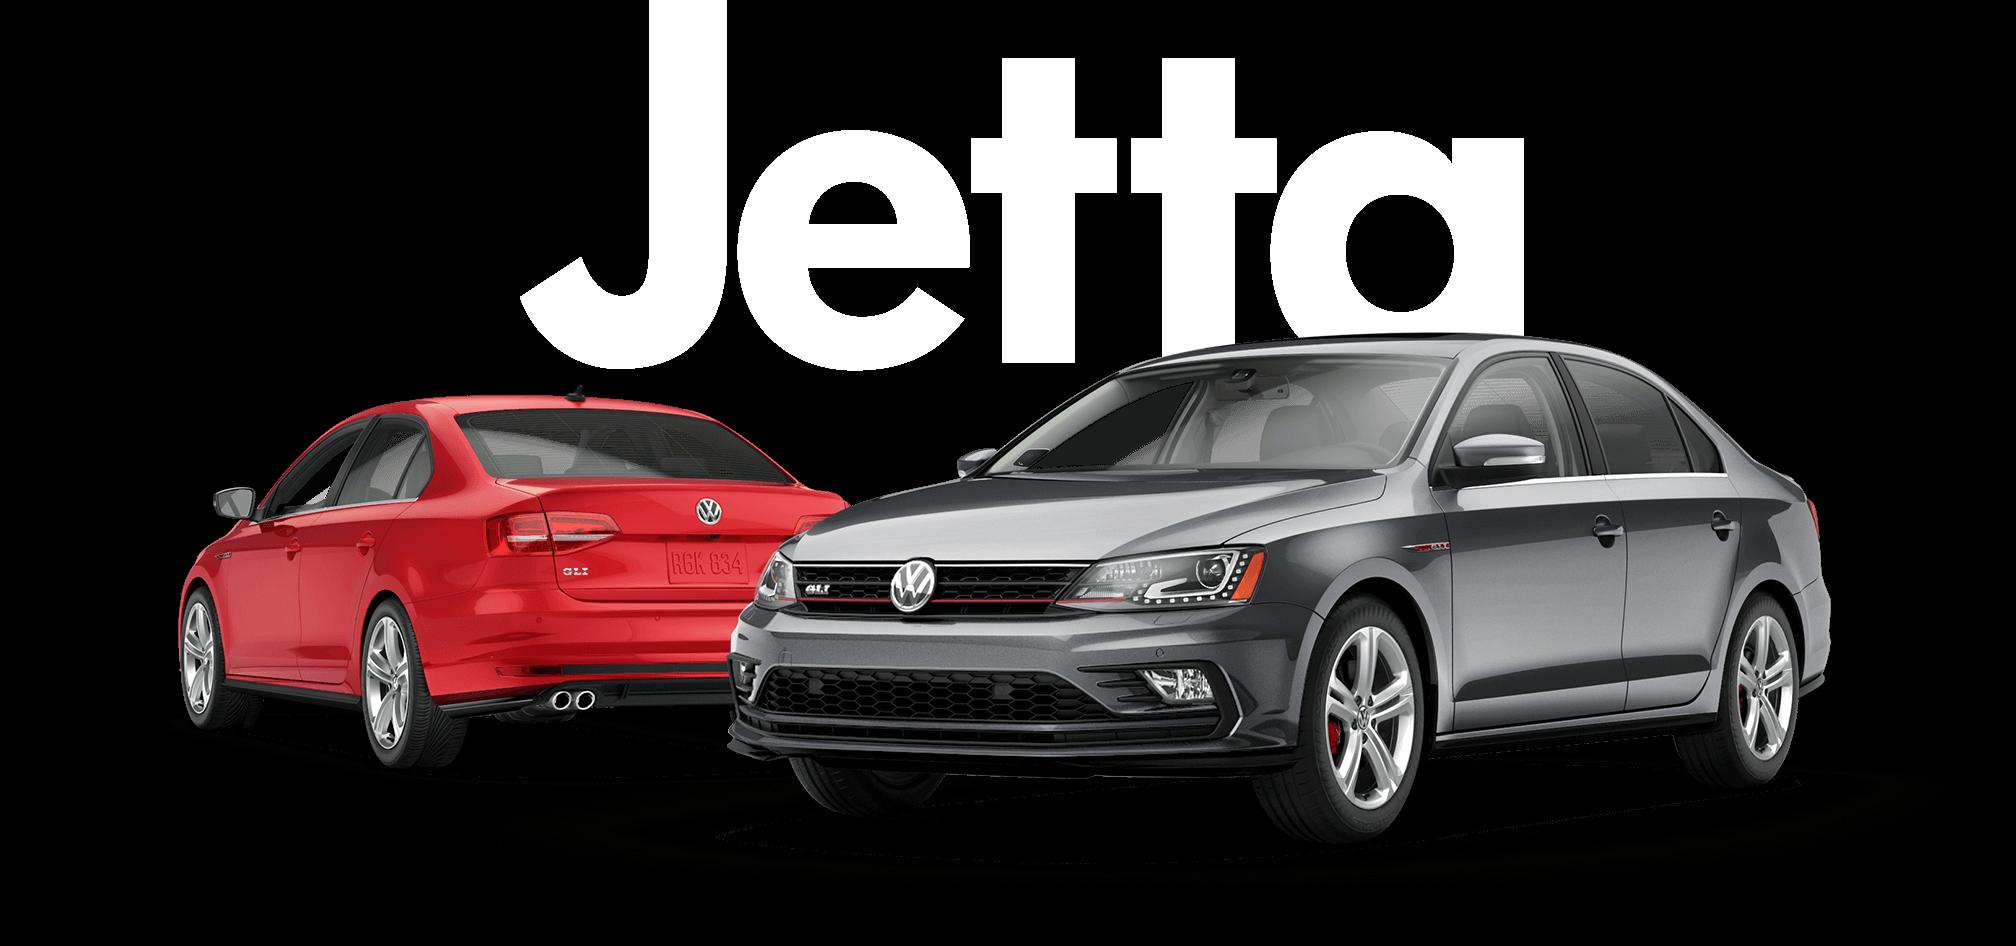 Volkswagen Jetta Lease Deals Ny | Lamoureph Blog